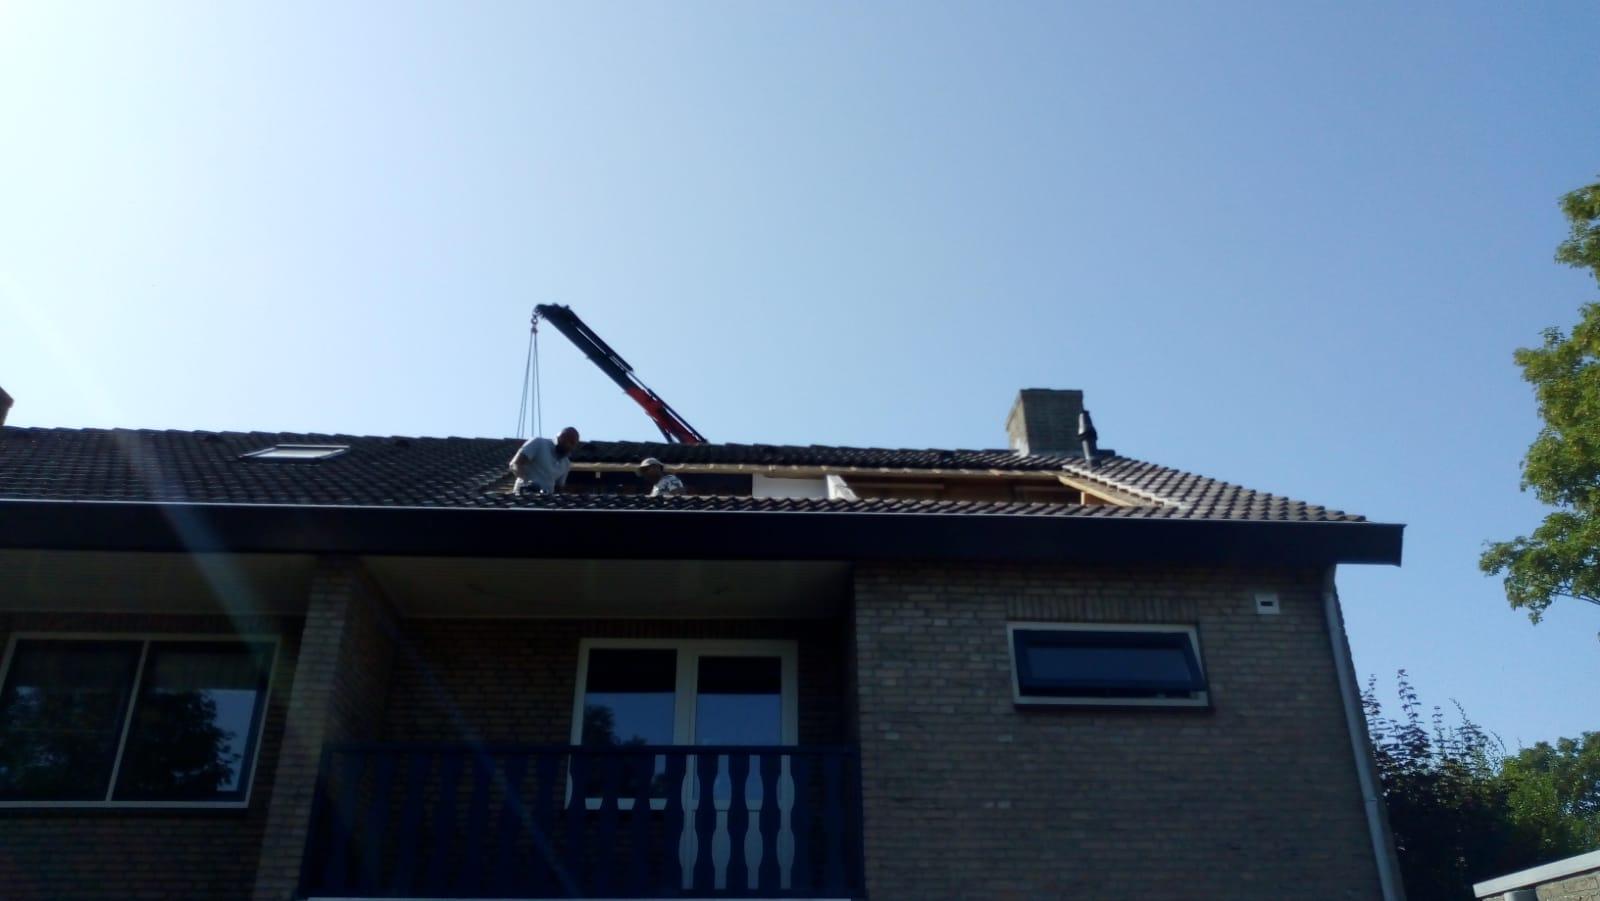 kinderkamer, kinderkamers, nieuwe kamers, klussen, verbouwen, mamablog, mamalifestyle, lalog.nl